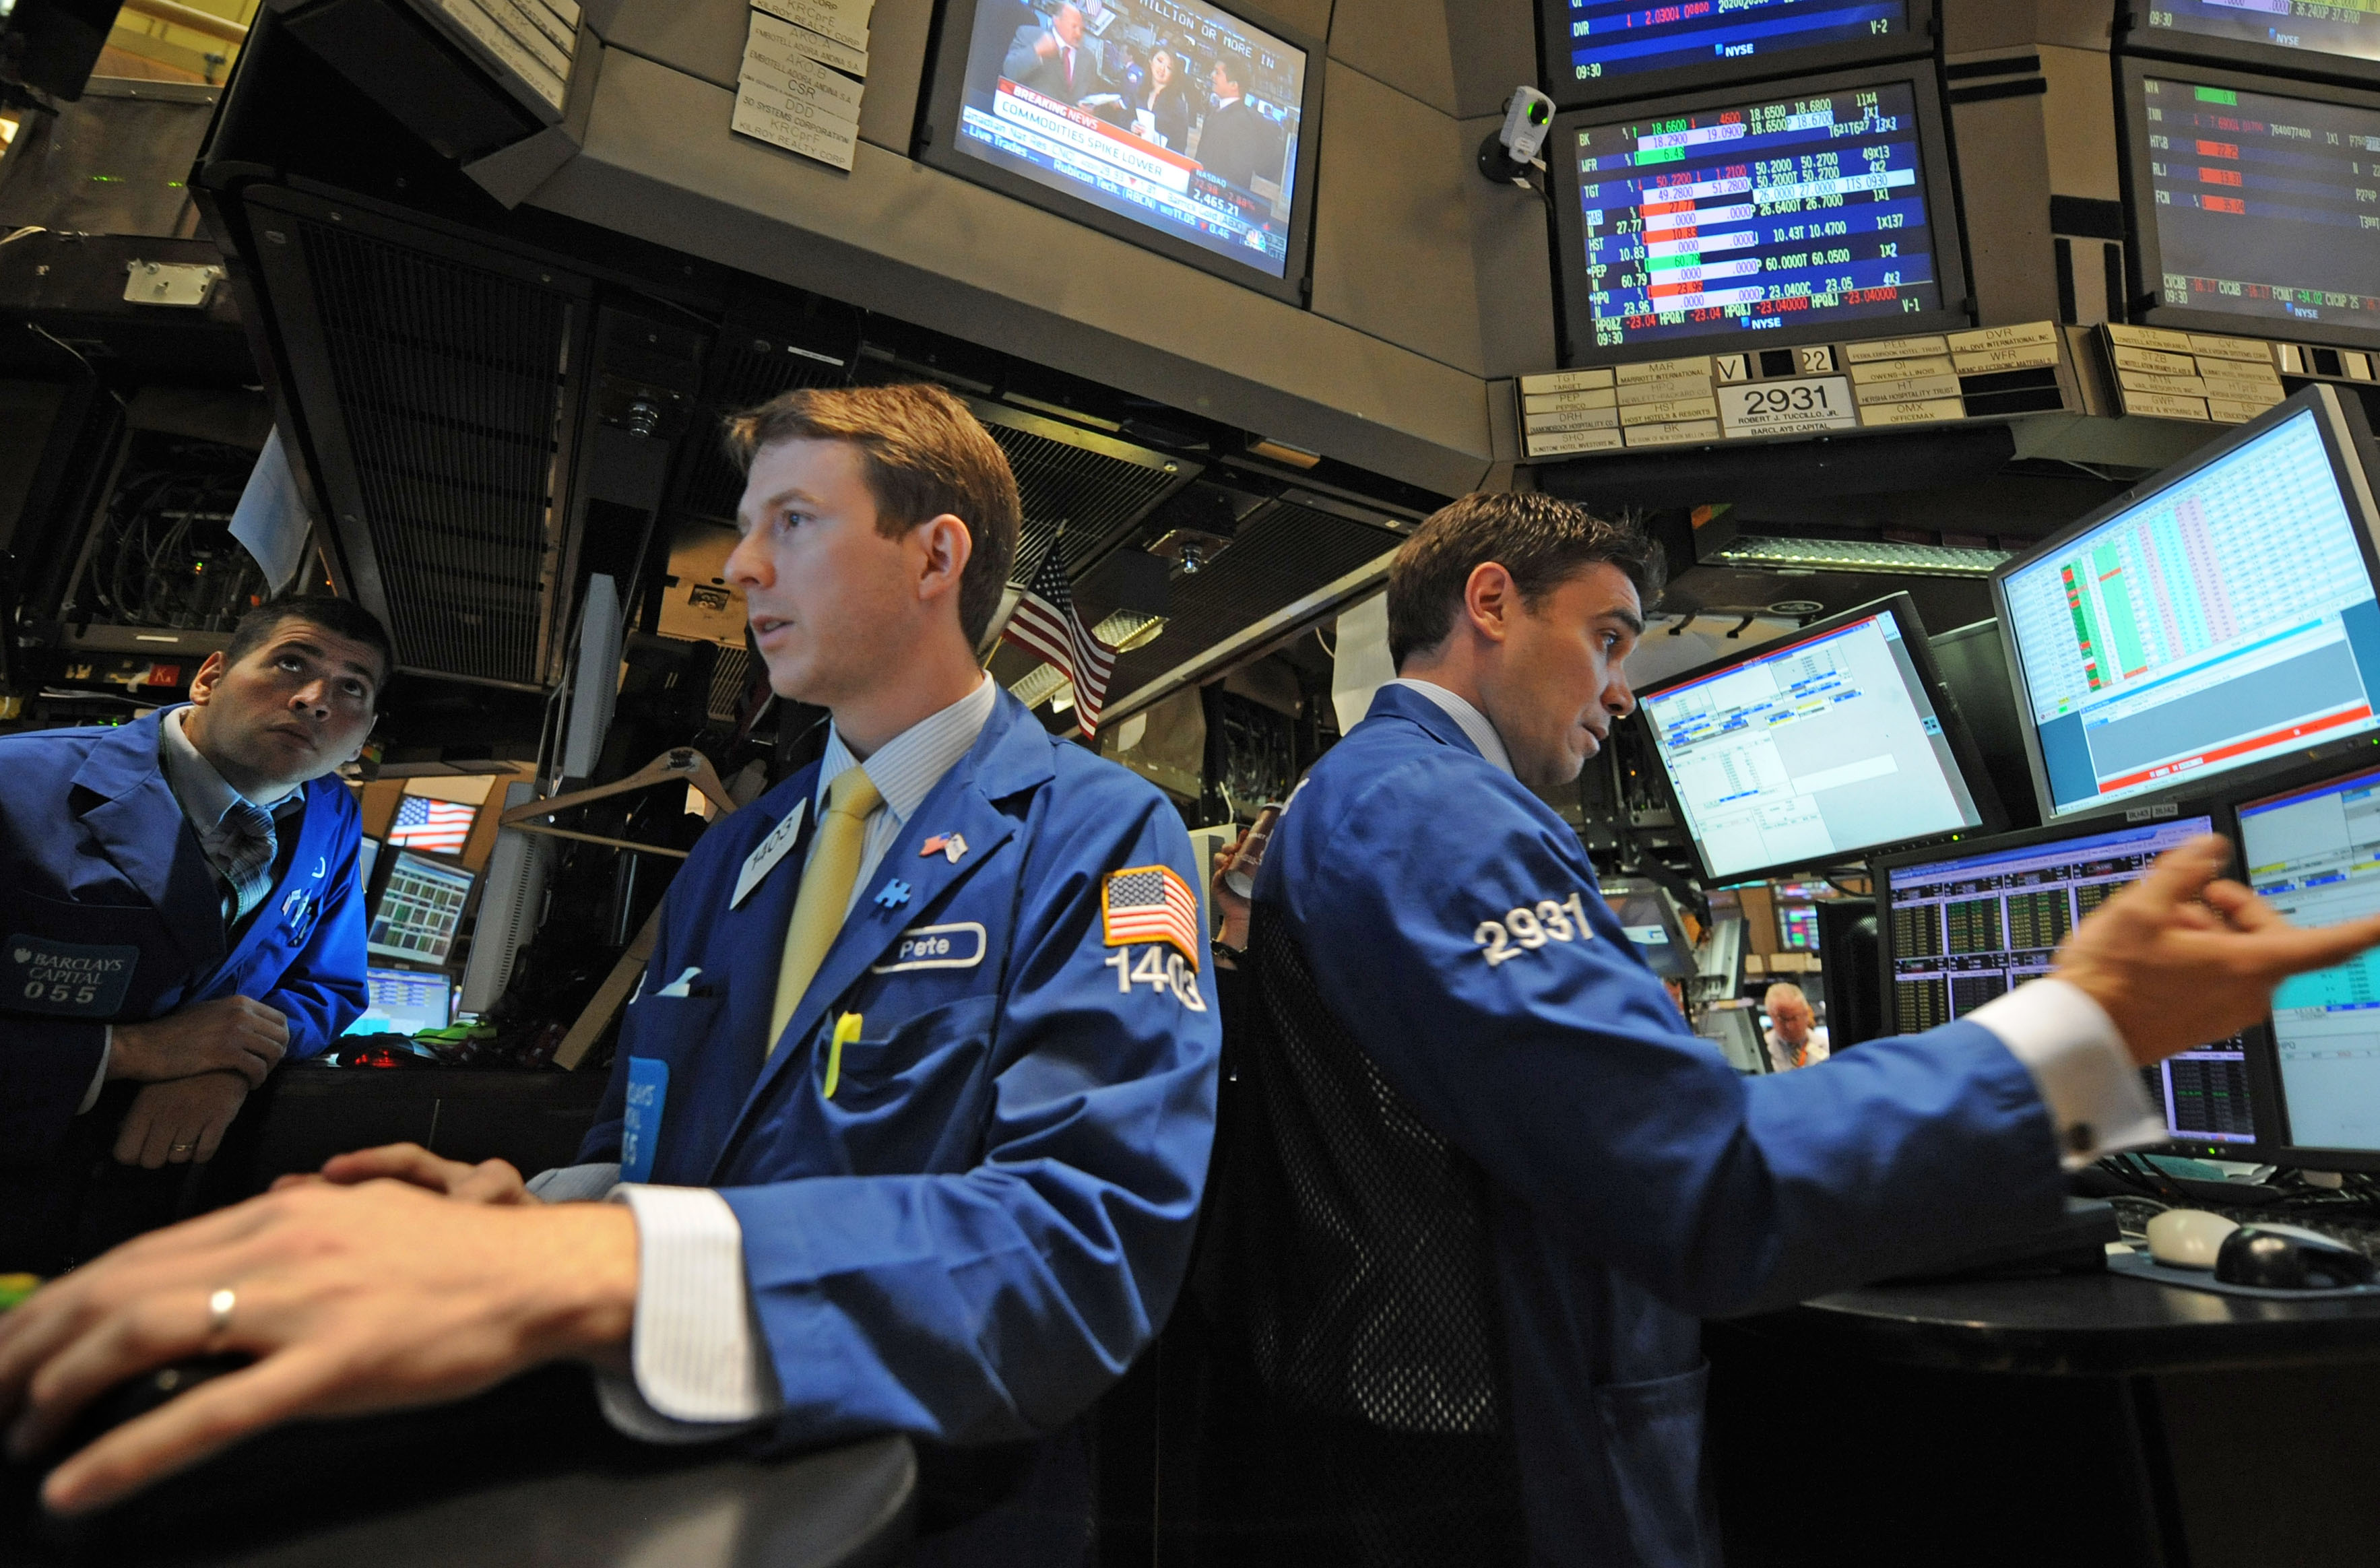 Traders World Ohio >> Wall Street and world markets fall sharply - The Blade